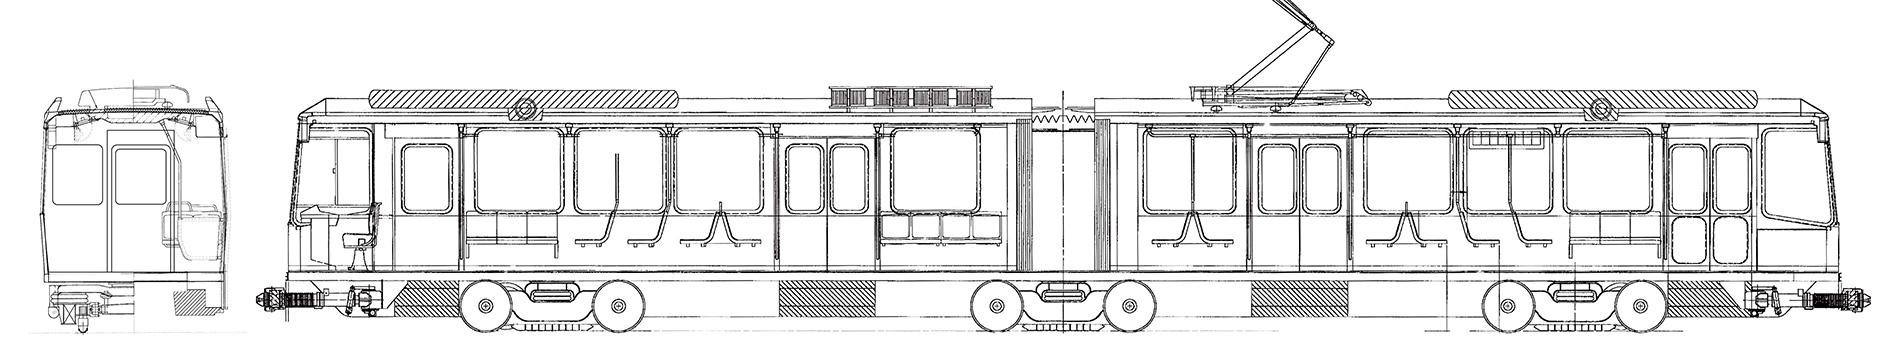 Drawn railroad metro train A I real weren't thing